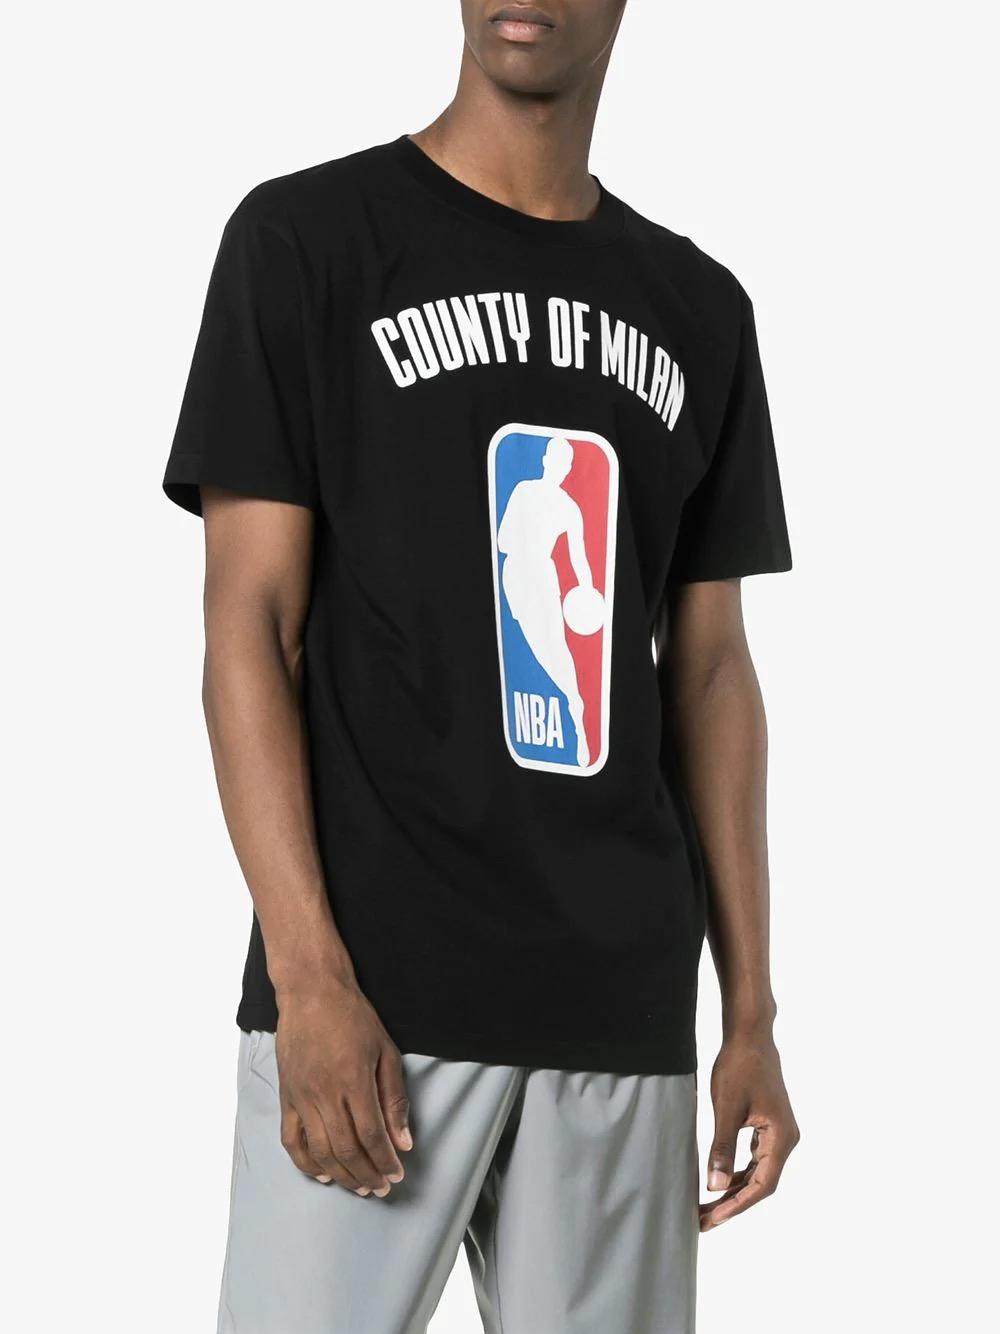 be102805c Dettagli su MARCELO BURLON x NBA COUNTY OF MILAN LOGO T-SHIRT UOMO  CMAA018F18001115